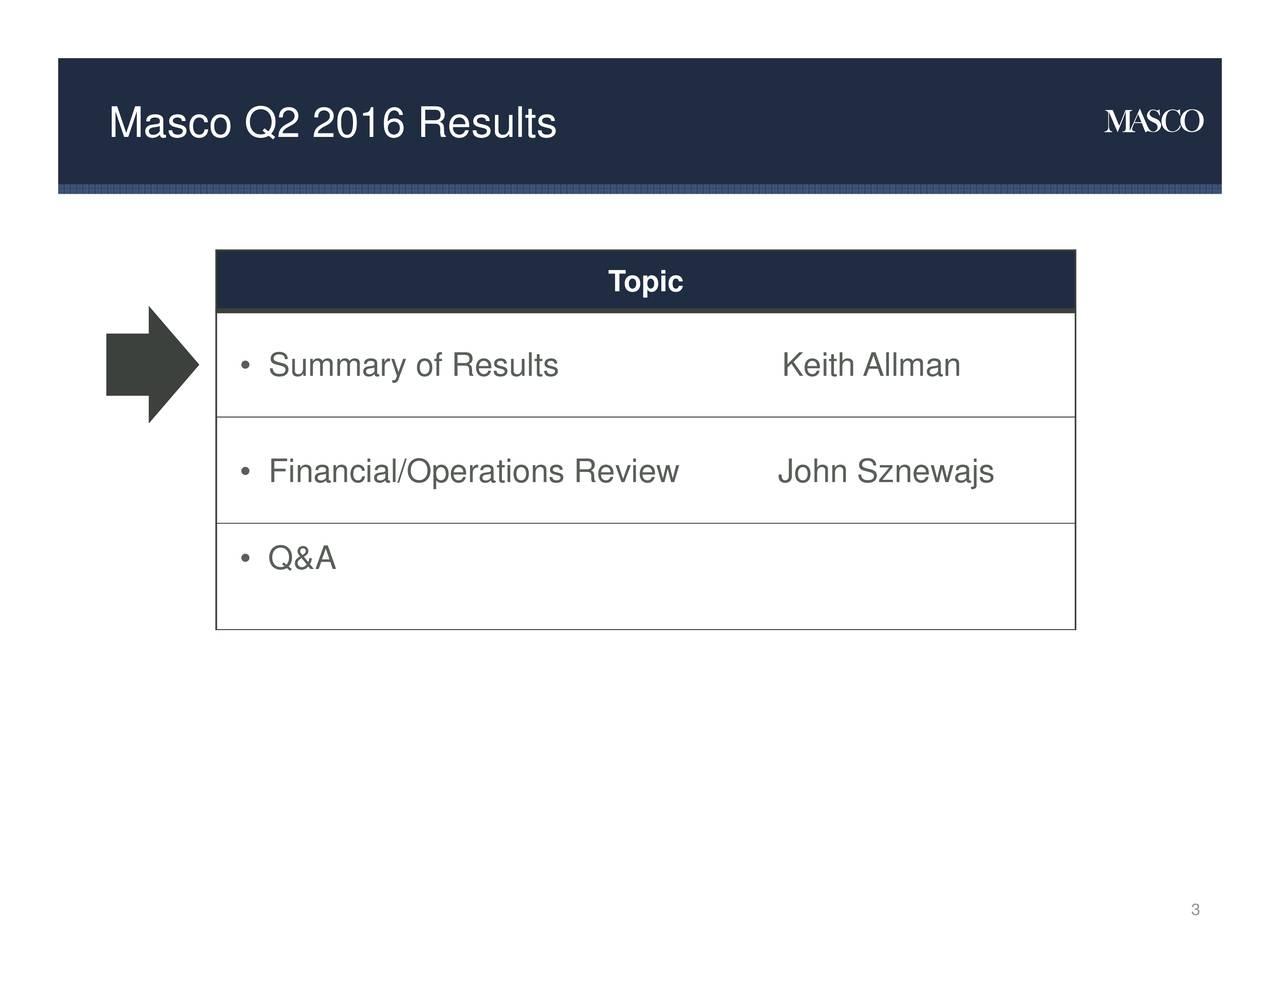 Topic Summary ofAesultsperations RevKeith Allmanznewajs Masco Q2 2016 Results